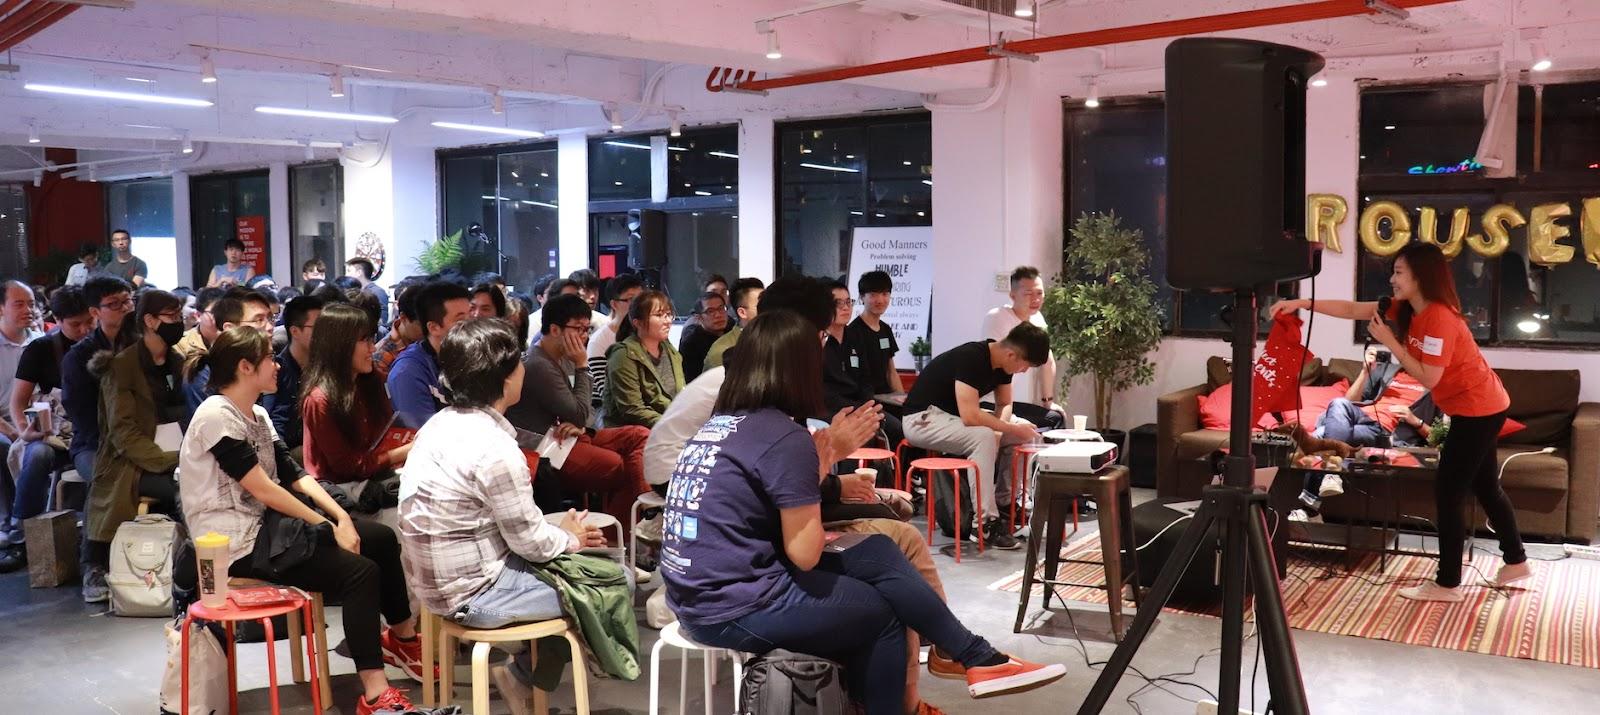 Carousell 旋轉拍賣台灣 HR Carol 負責主持這次技術分享會